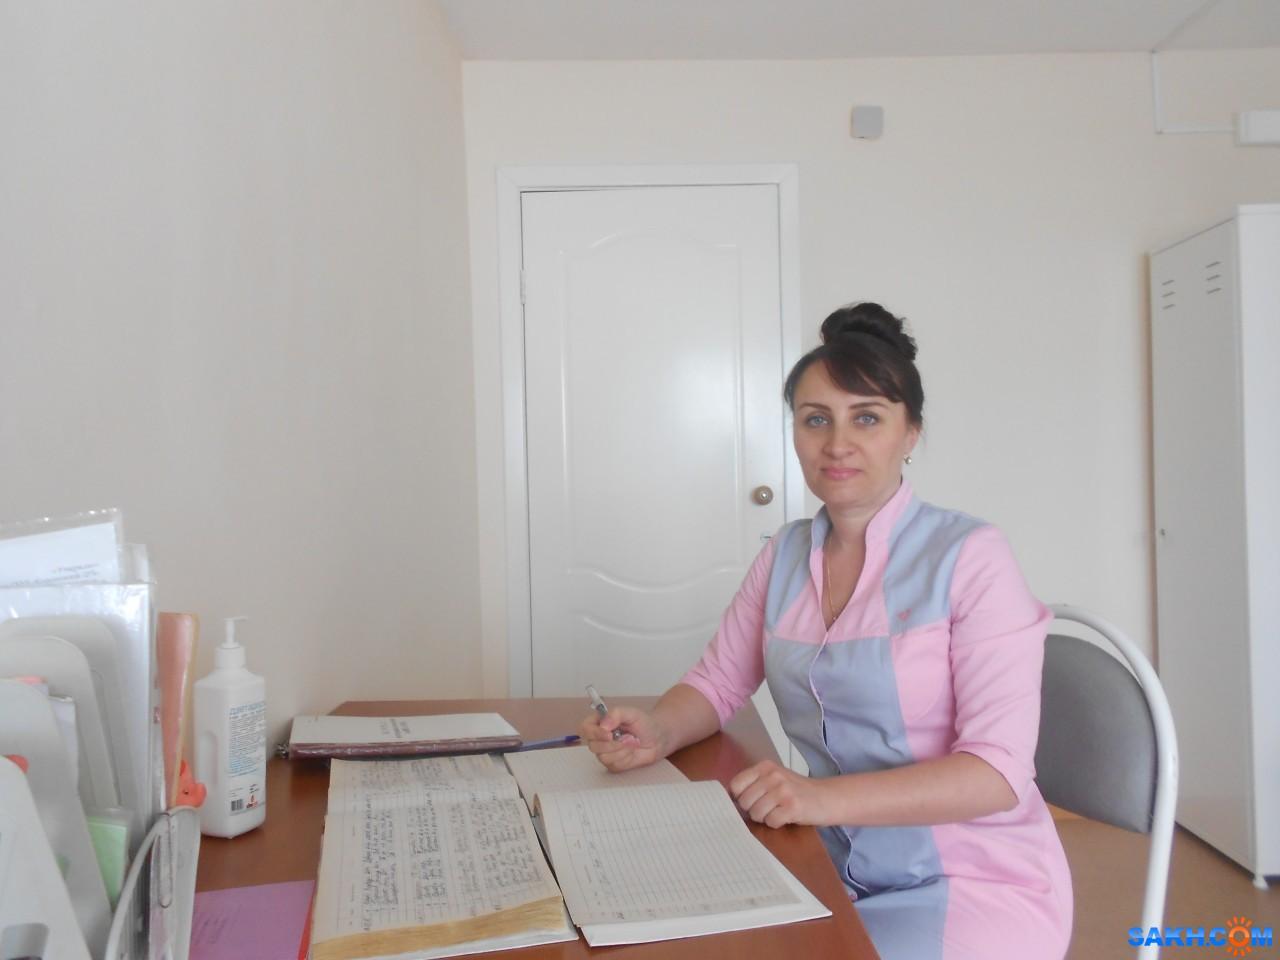 Трахнул медсестру у неё в кабинете, Клиент трахнул медсестру в кабинете 13 фотография